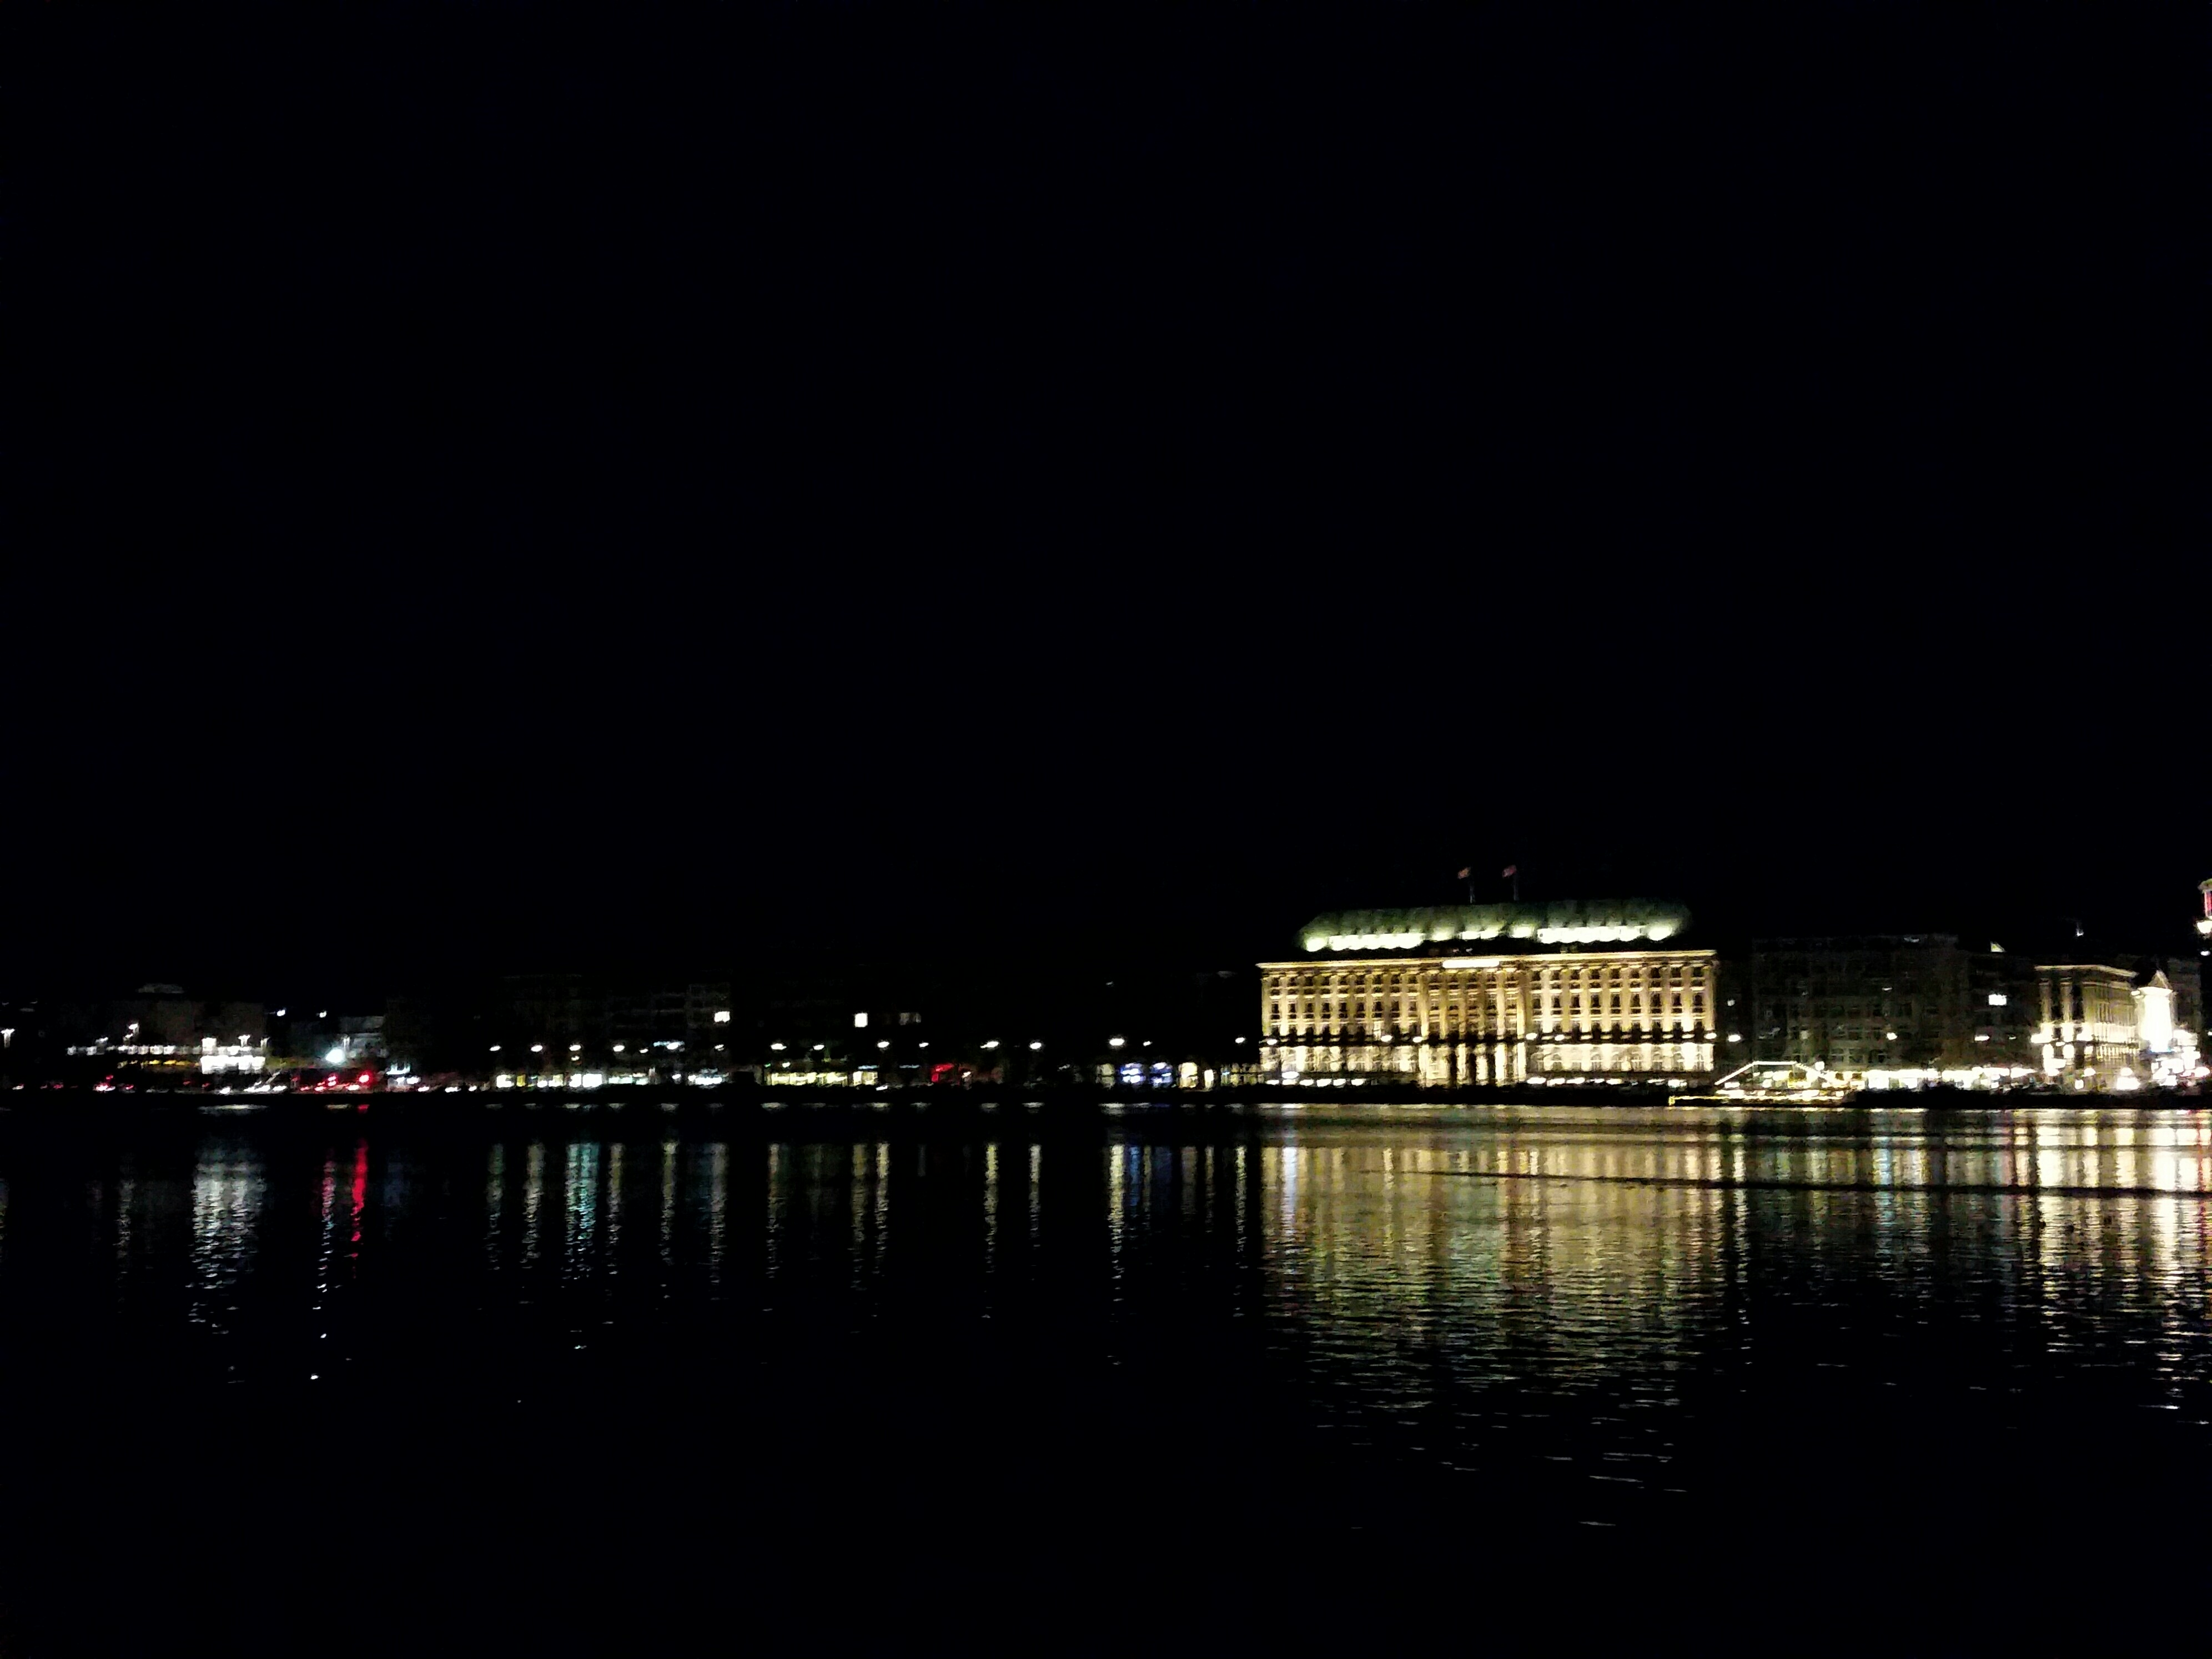 Hamburger Alster bei Nacht, Architecture, Black background, Bridge, Hamburg, HQ Photo